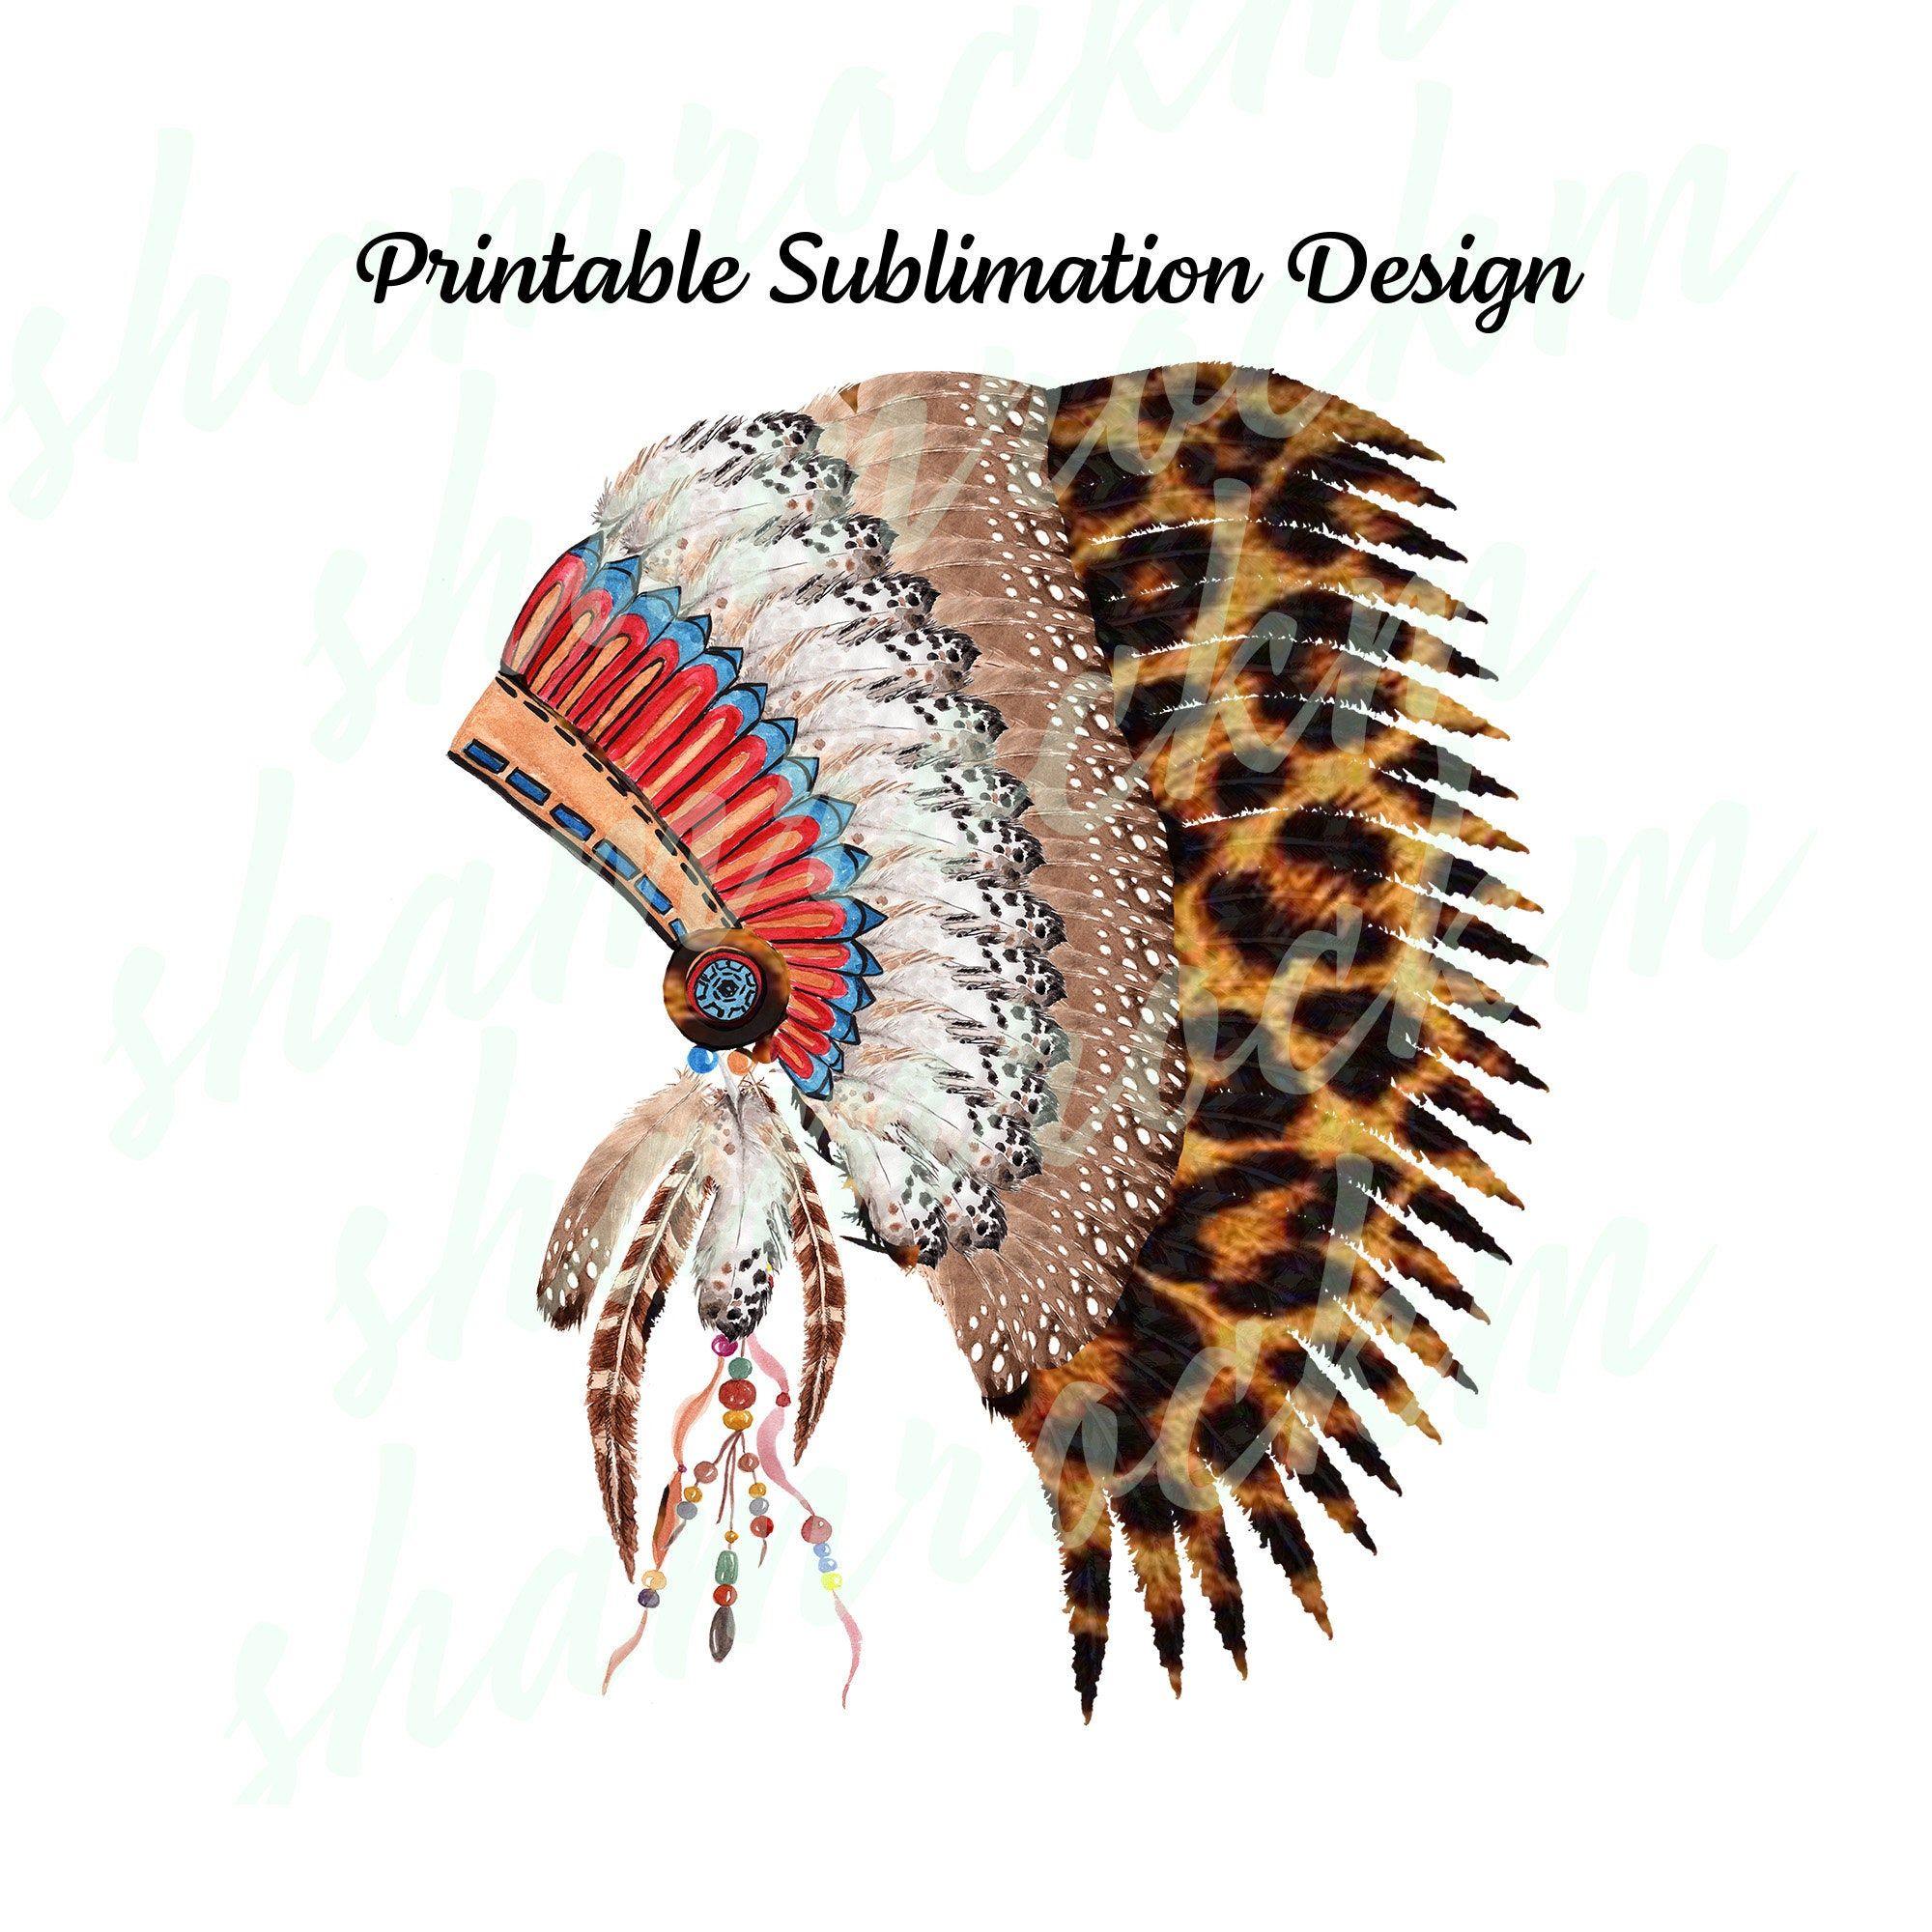 Printable Sublimation Design Native American Headdress Png Etsy Native American Headdress Digital Art Design Stencil Patterns Templates